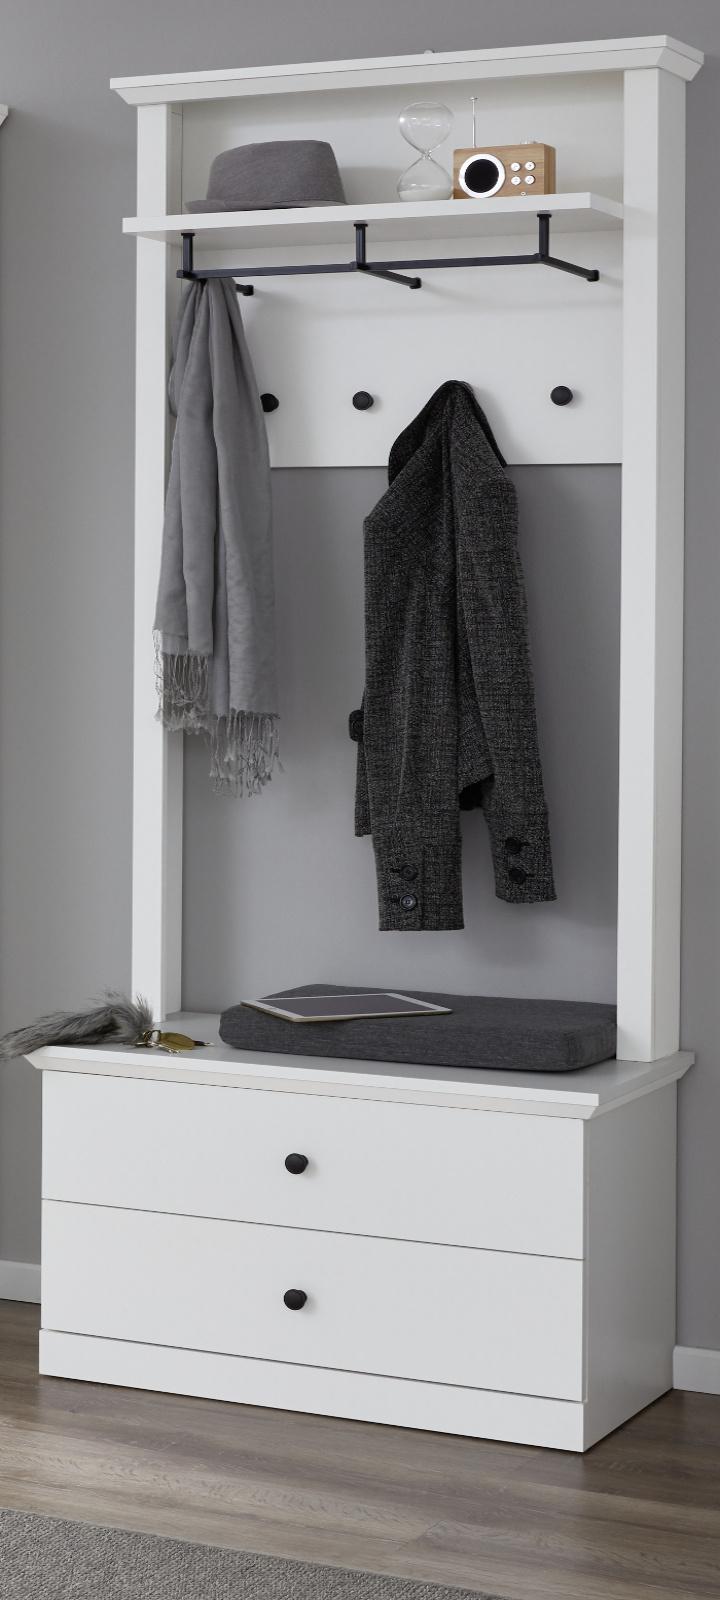 Garderobe Baxter 2 Teilig Weiss Landhaus